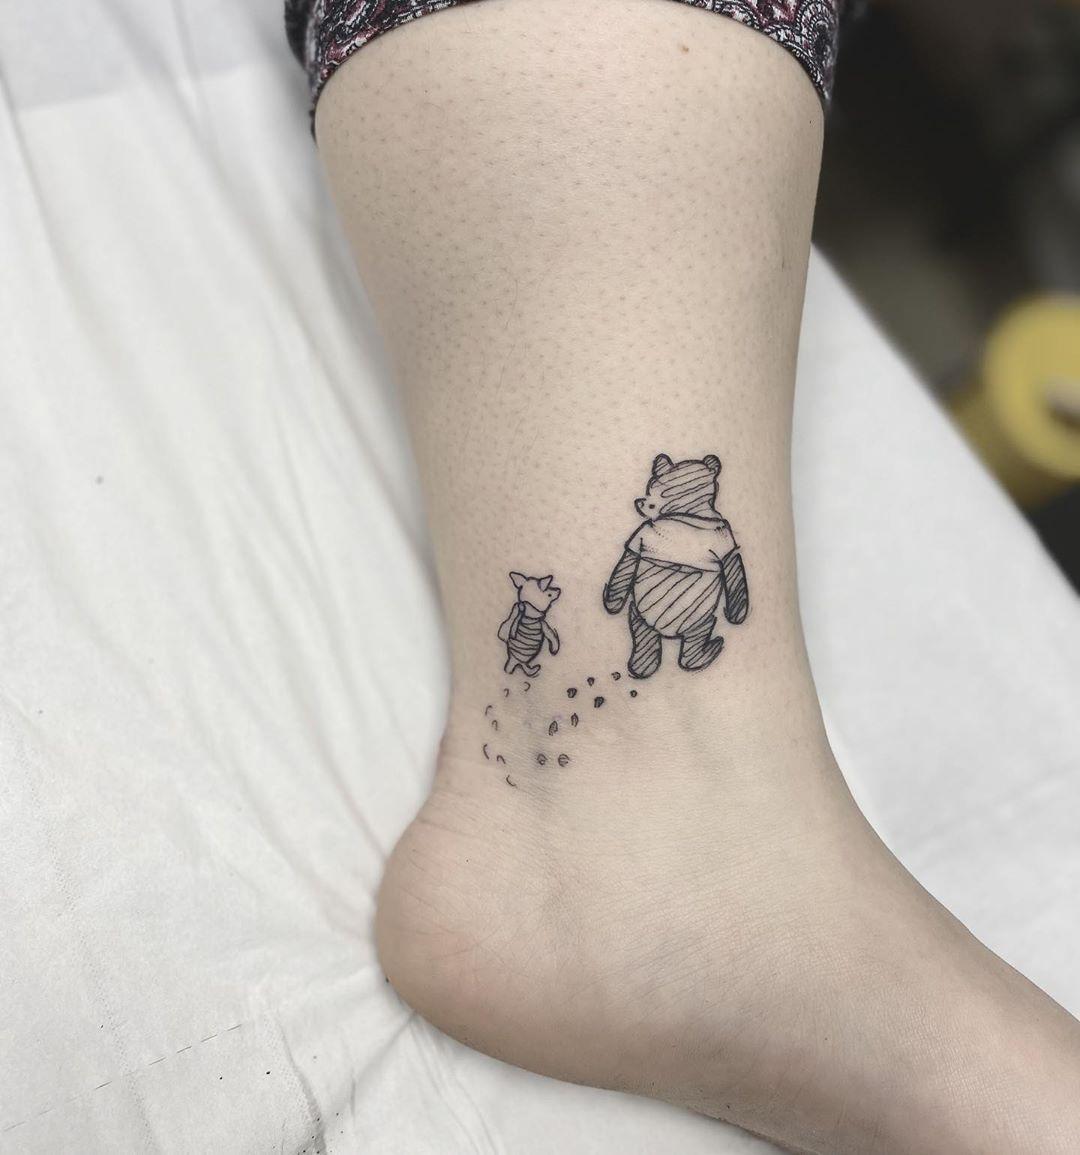 Uplifting Winnie the Pooh Tattoos